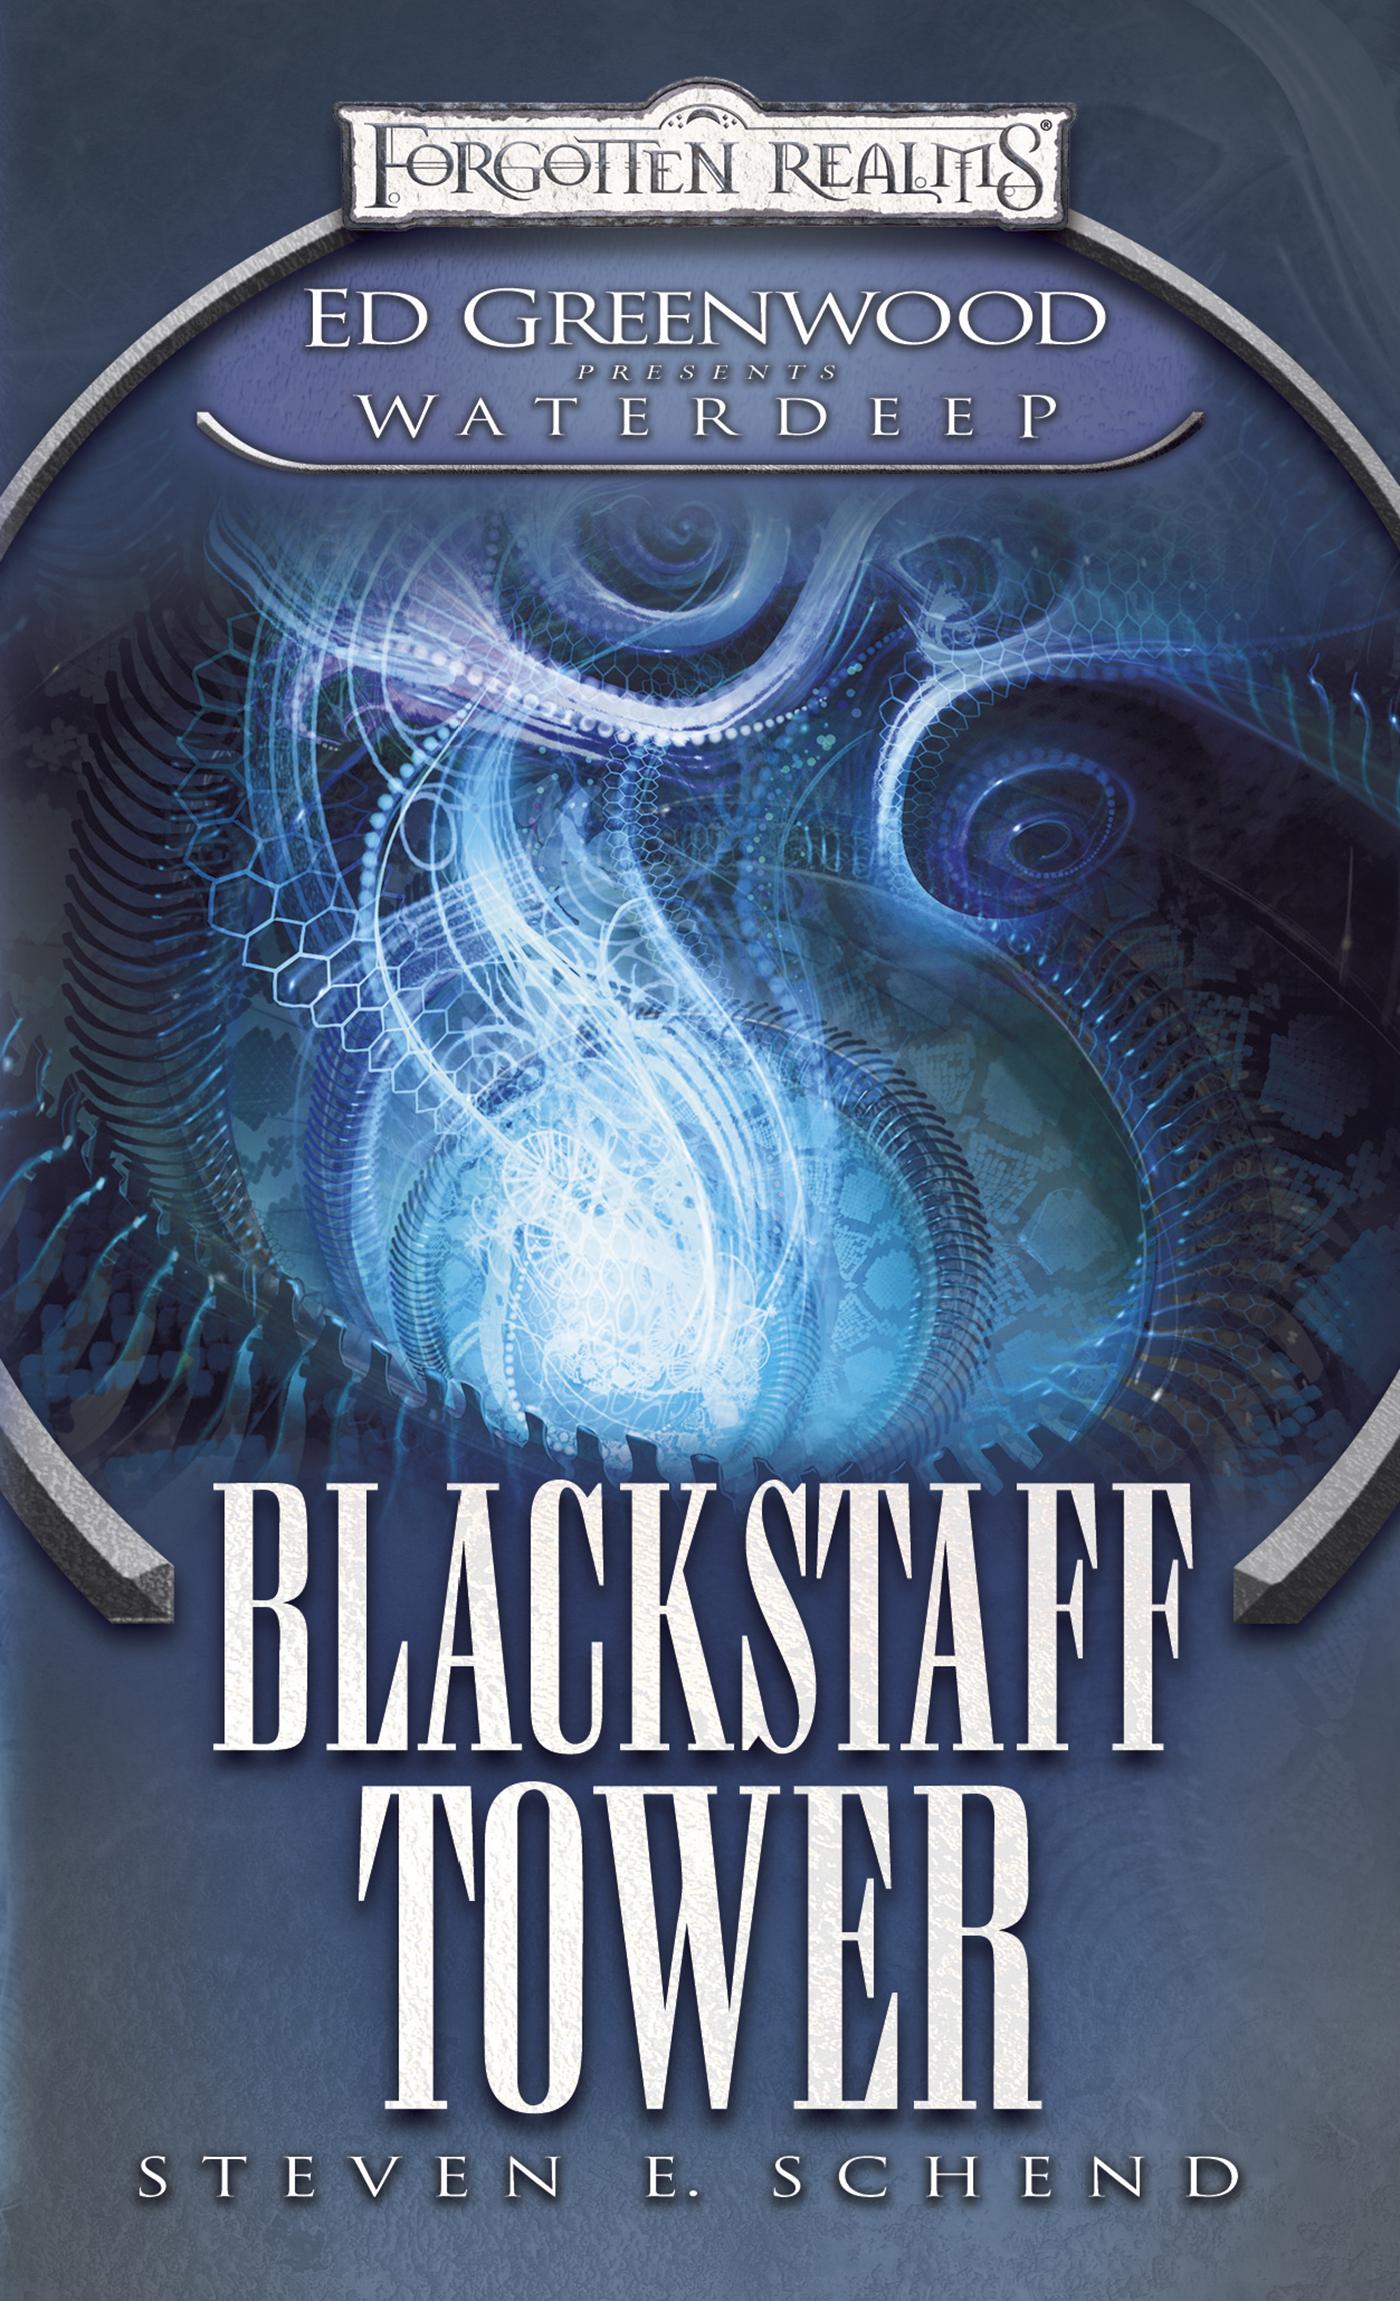 Blackstaff Tower Novel Forgotten Realms Wiki Fandom